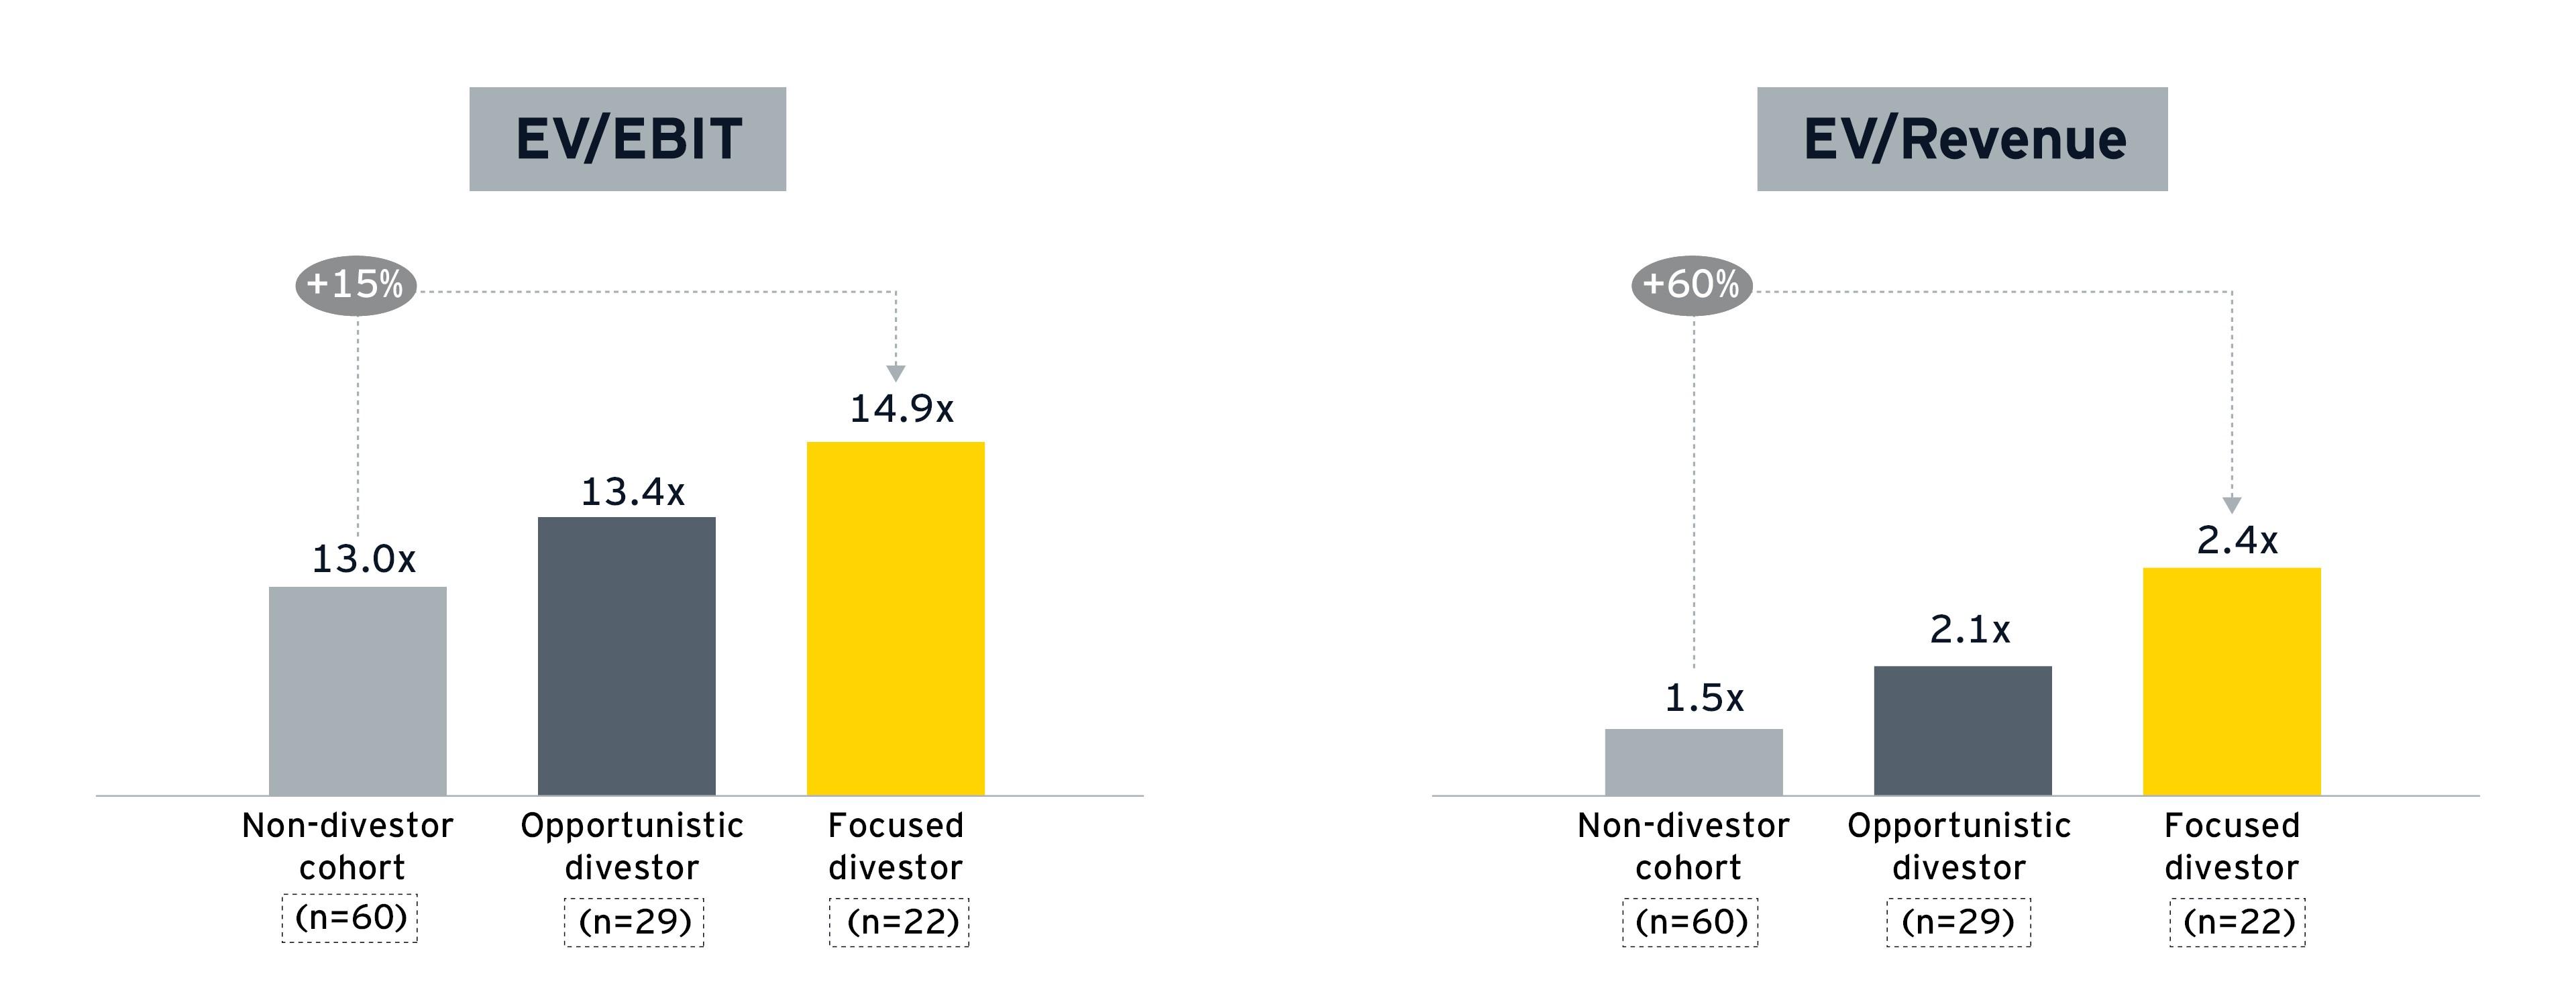 Focused divestors higher valuation multiples EV/EBIT, EV/revenue